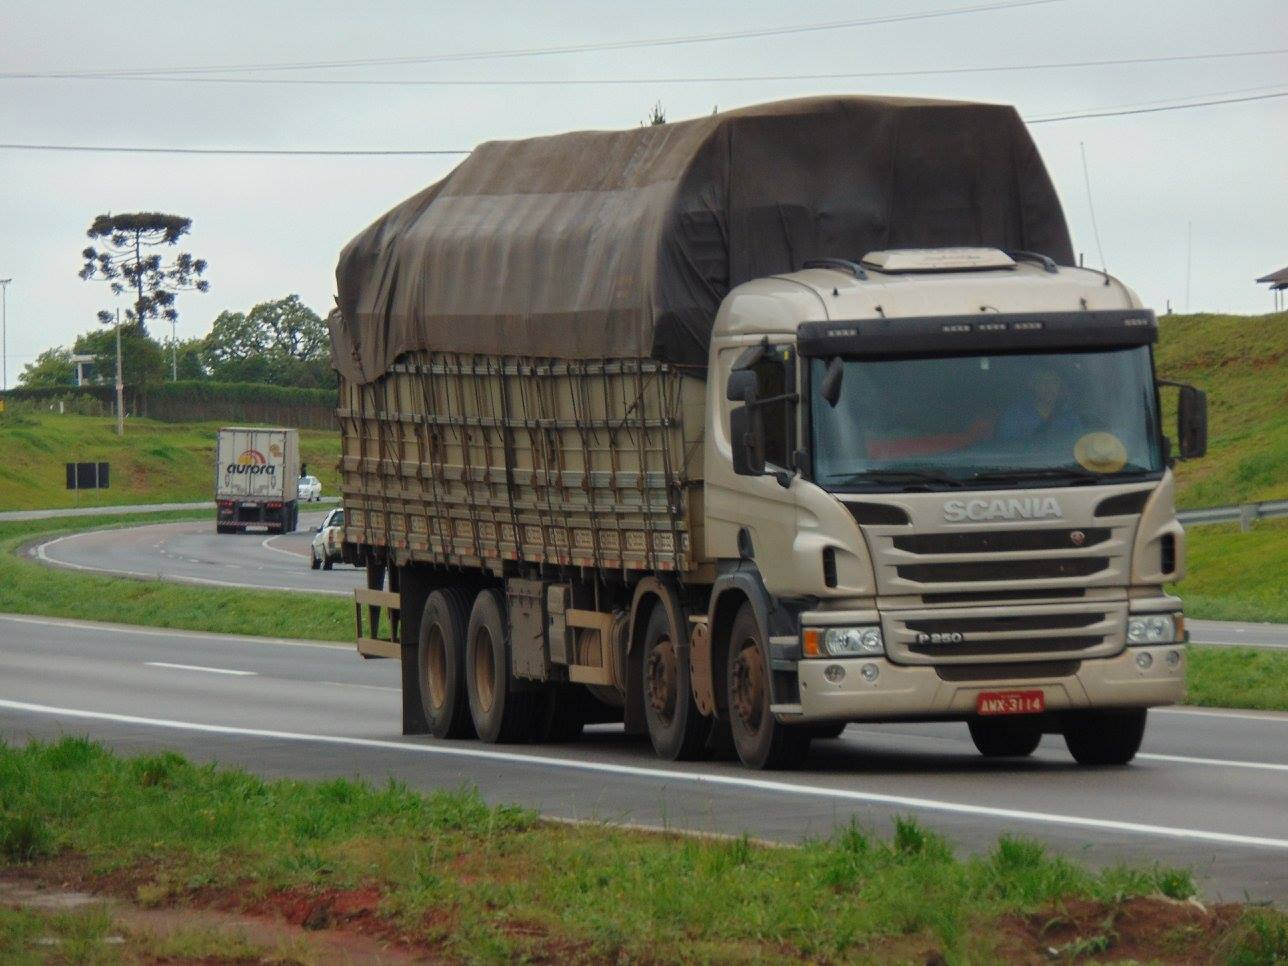 Scania-photo-5-1--2015-7